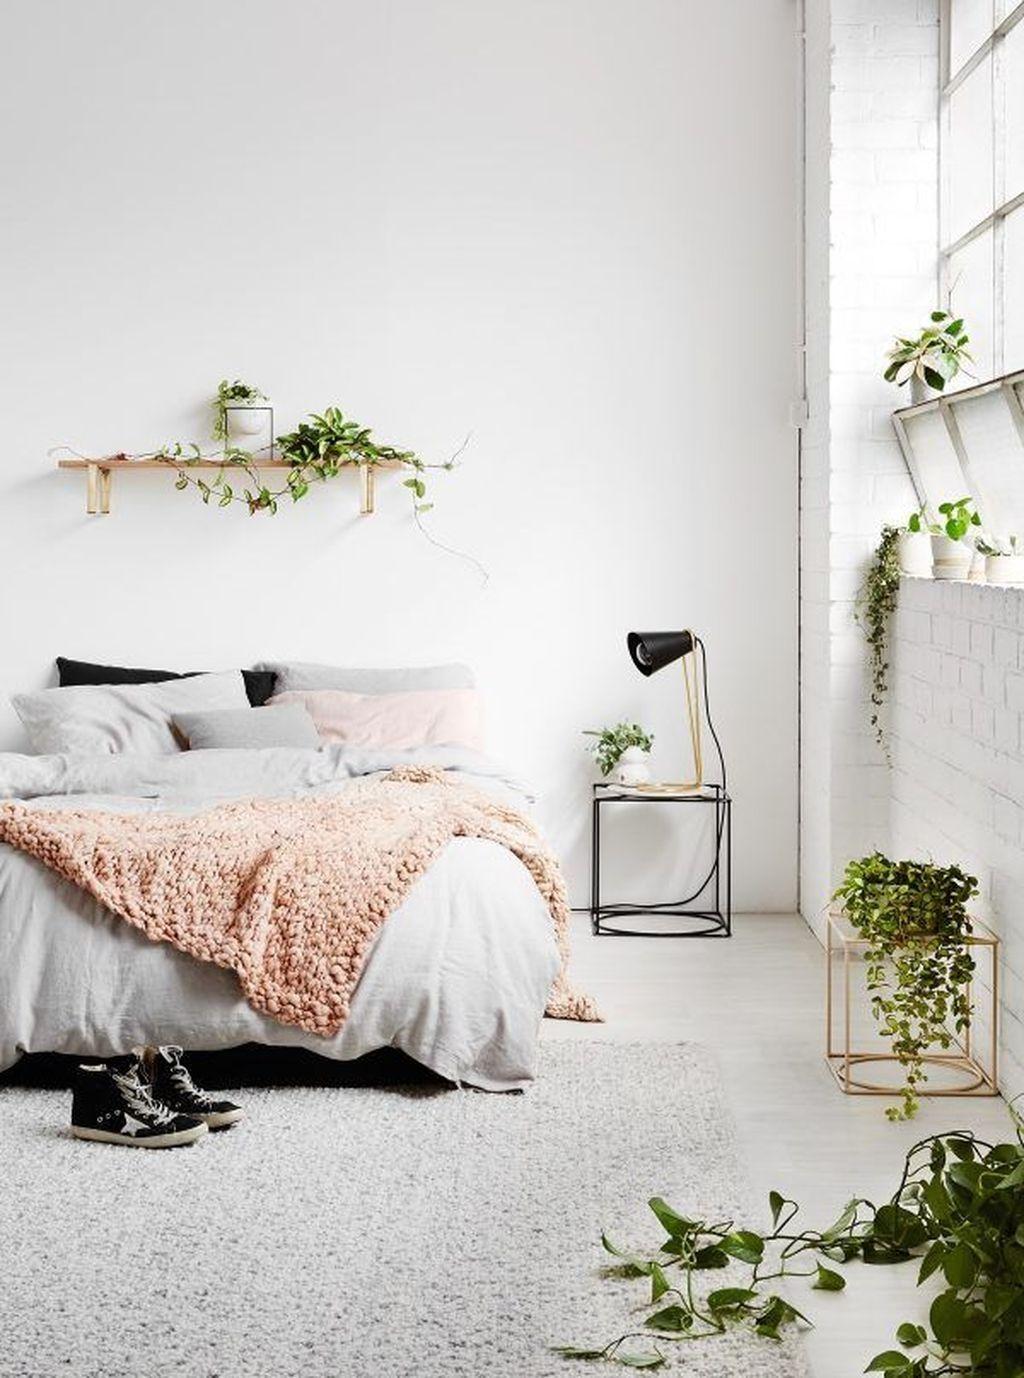 Impressive 34 Inspiring Minimalist Bedroom Decor Ideas